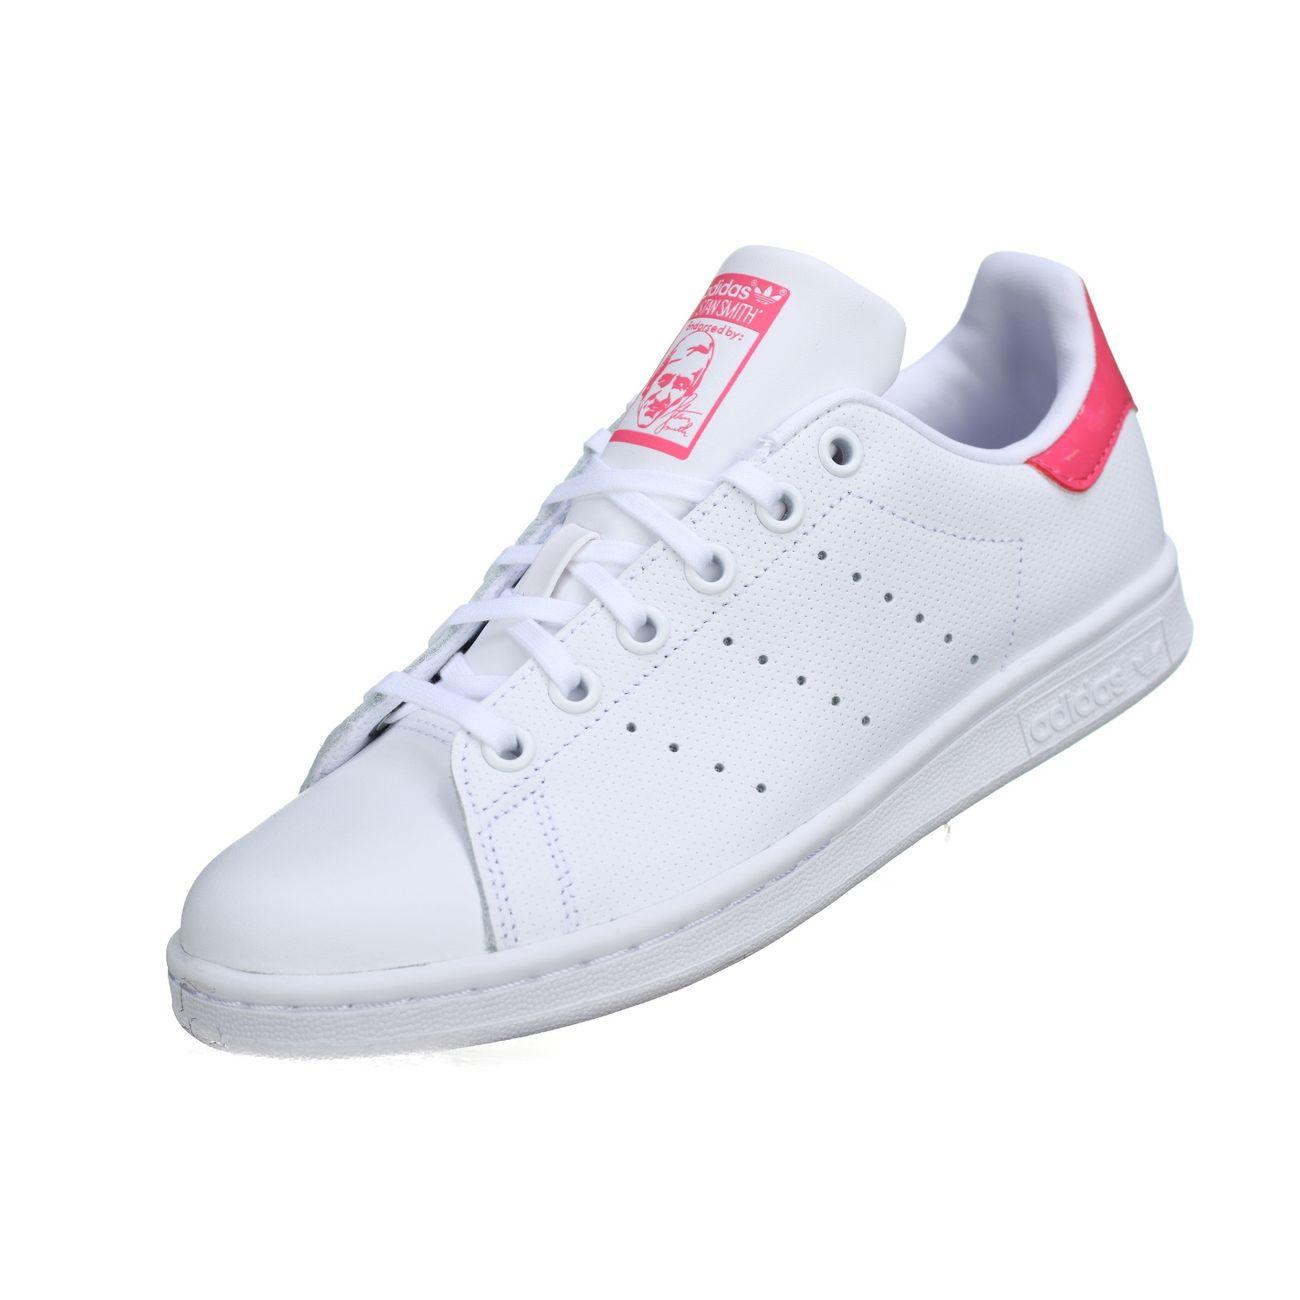 nouveau concept e2454 f2f6e italy adidas stan smith tout blanc prix 93dfe 9837a